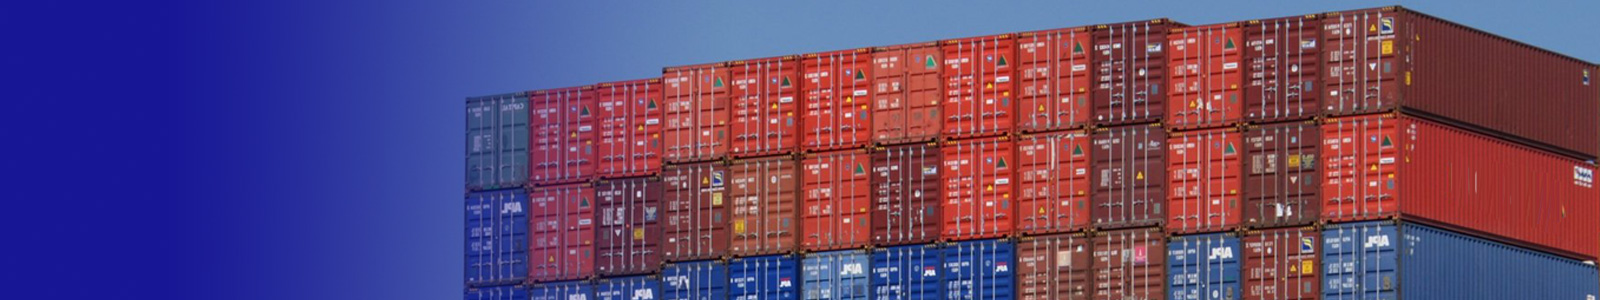 banner-contenedor-container